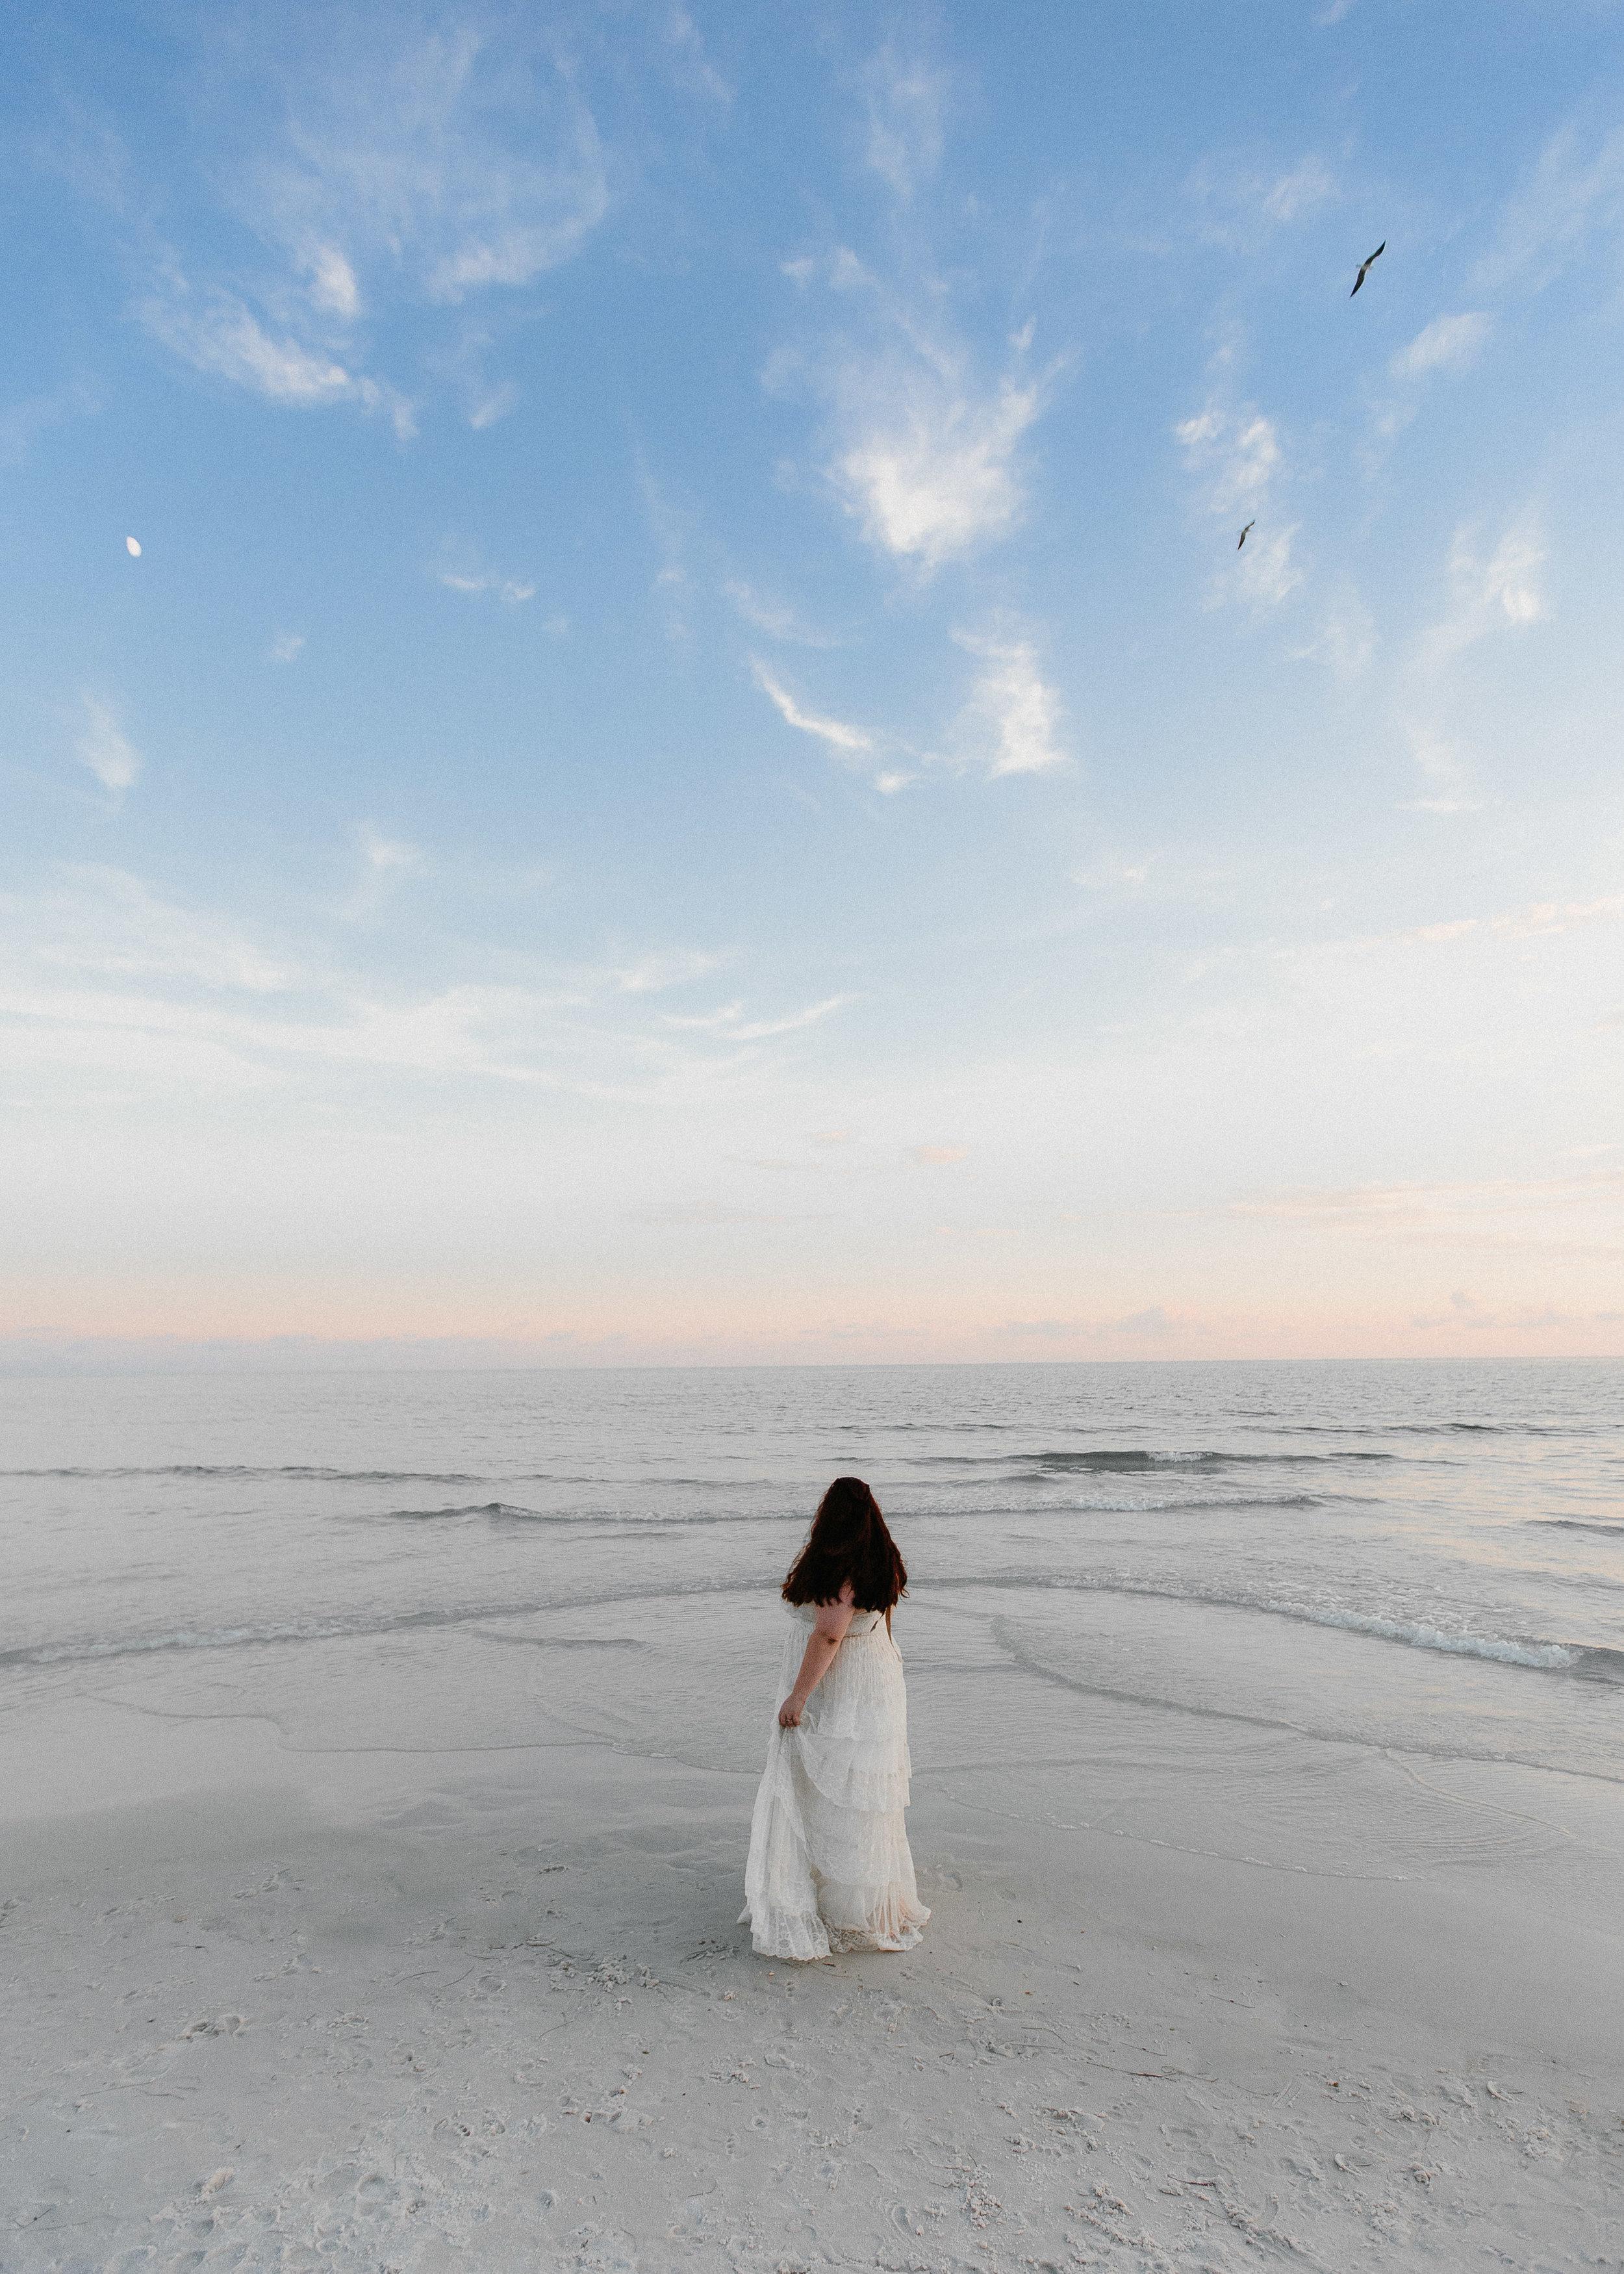 destin_sunset_beach_elopement_intimate_wedding_photographer_florida_documentary_1342.jpg